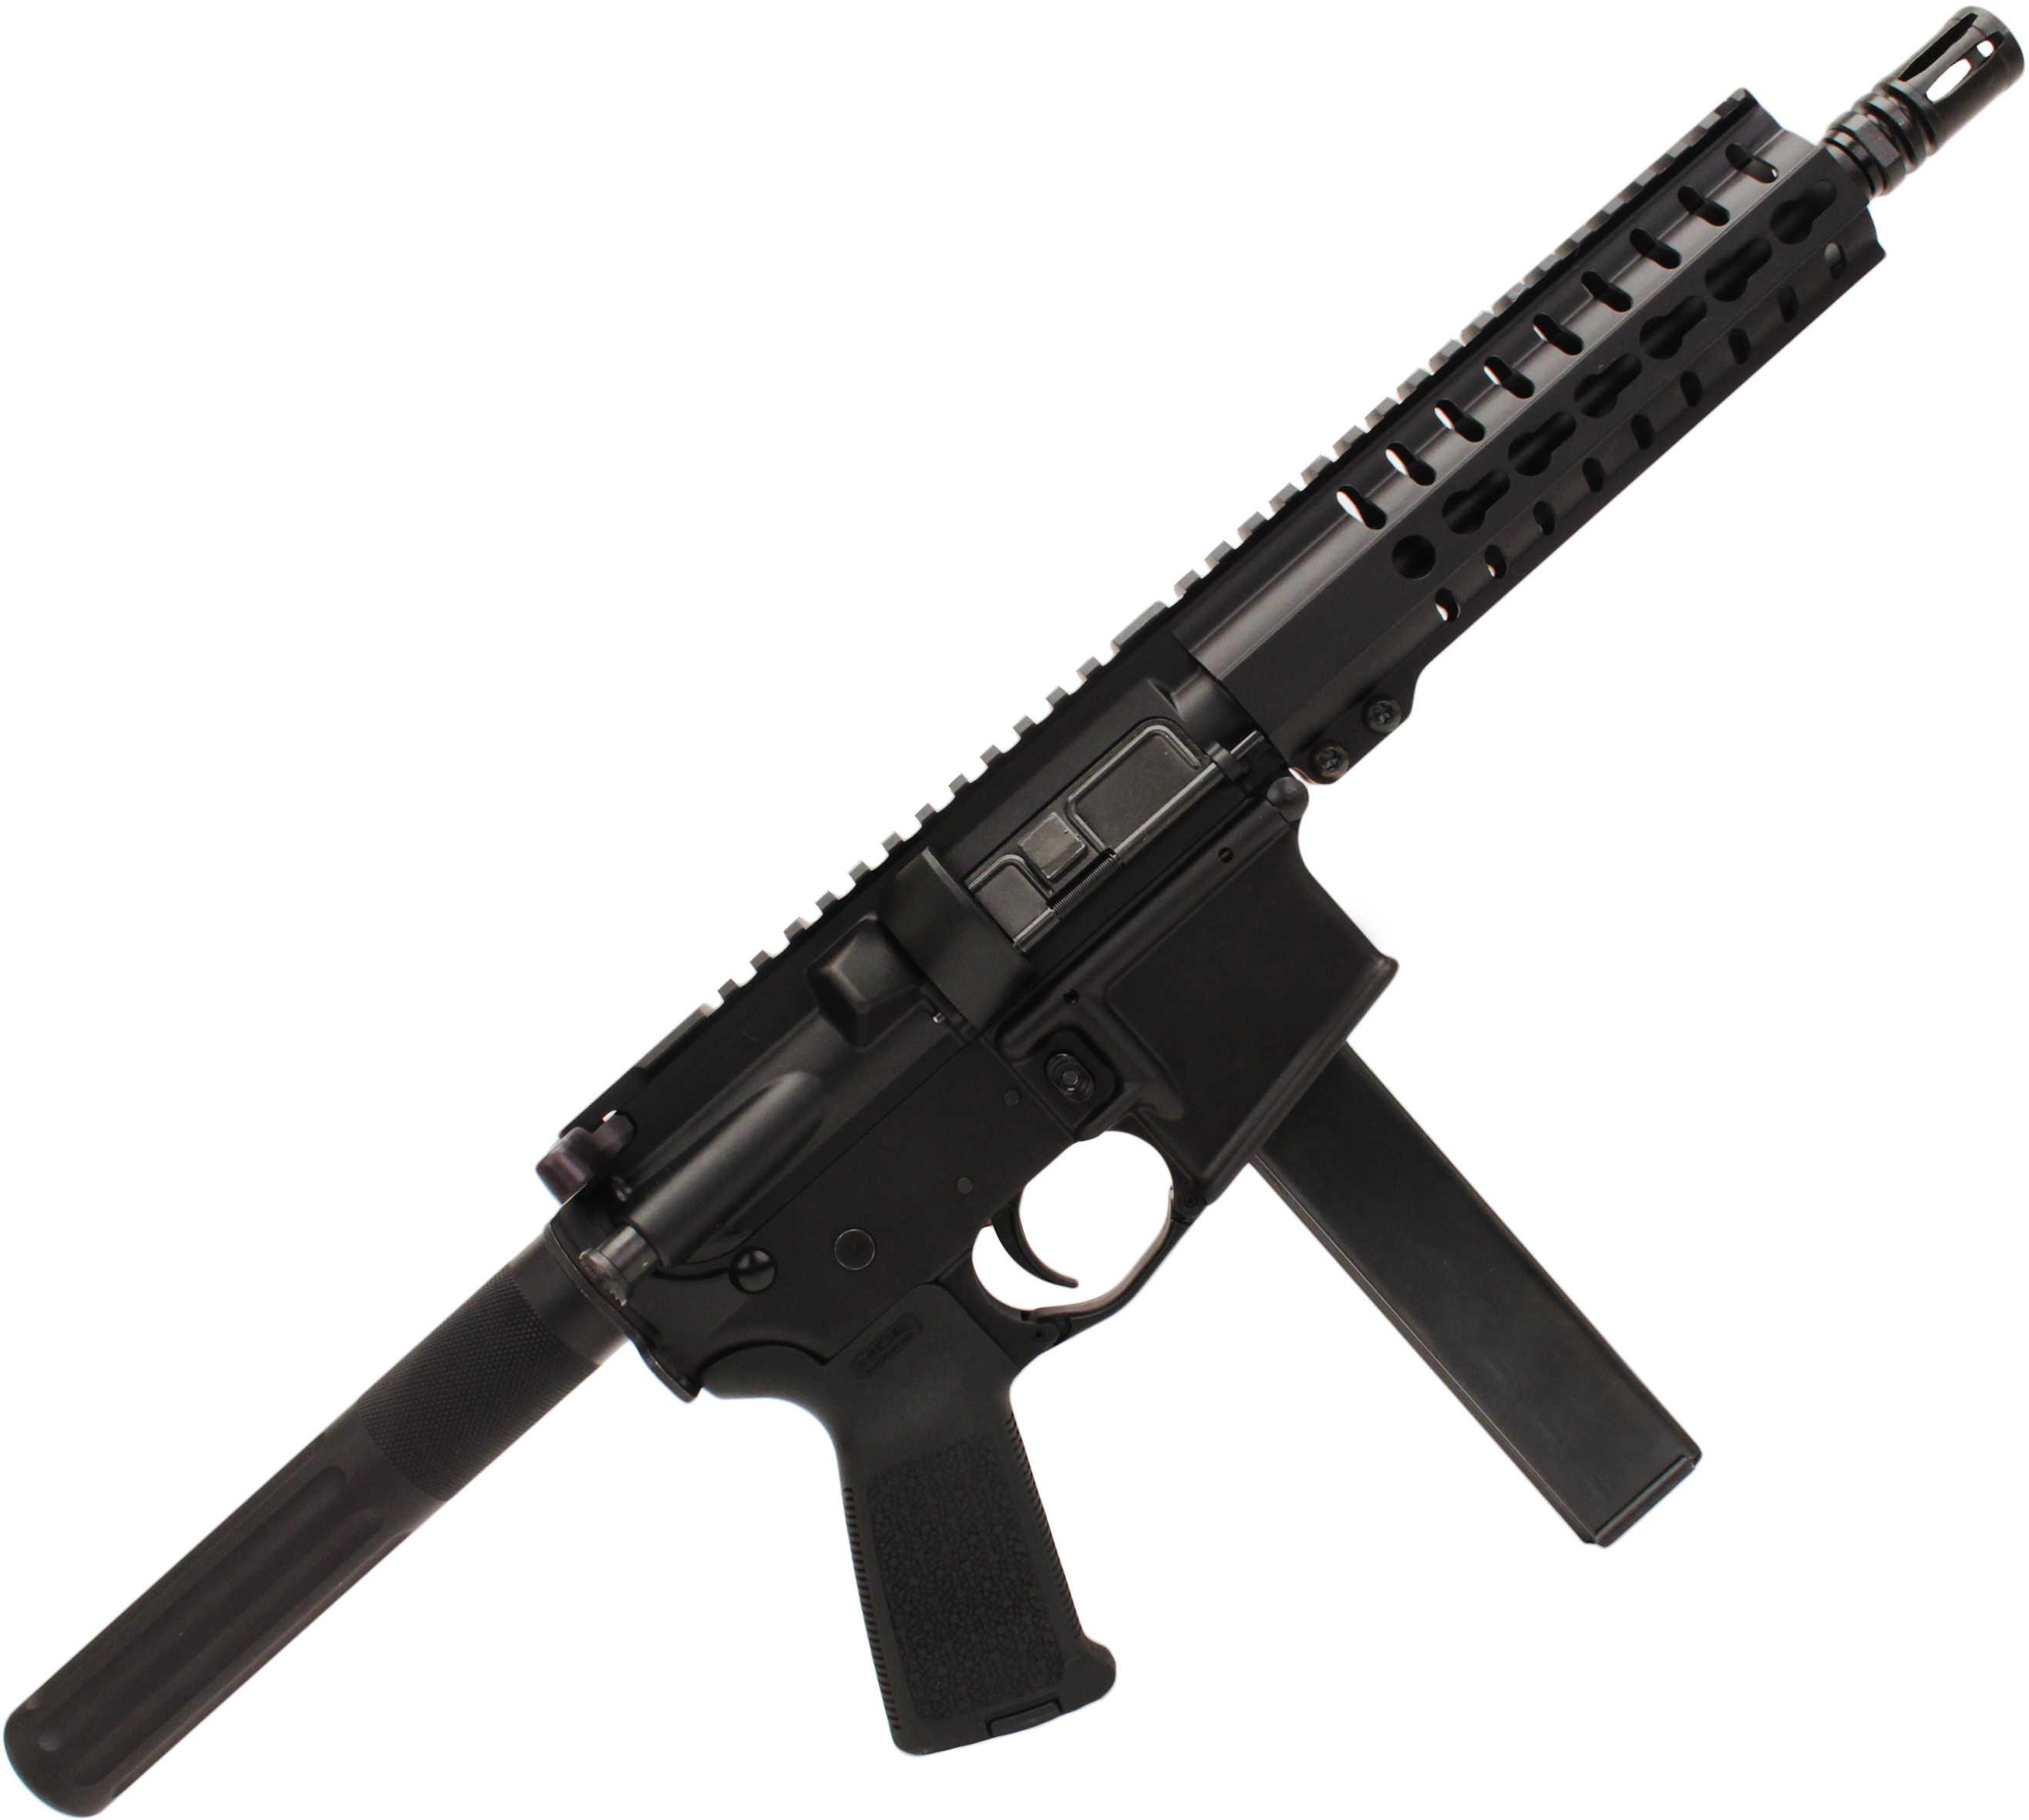 "CMMG, Inc CMMG MK4 PDW 9mm Luger 8.2"" Barrel 30 Round Magpul Black Semi Automatic Pistol 90A3BAD"